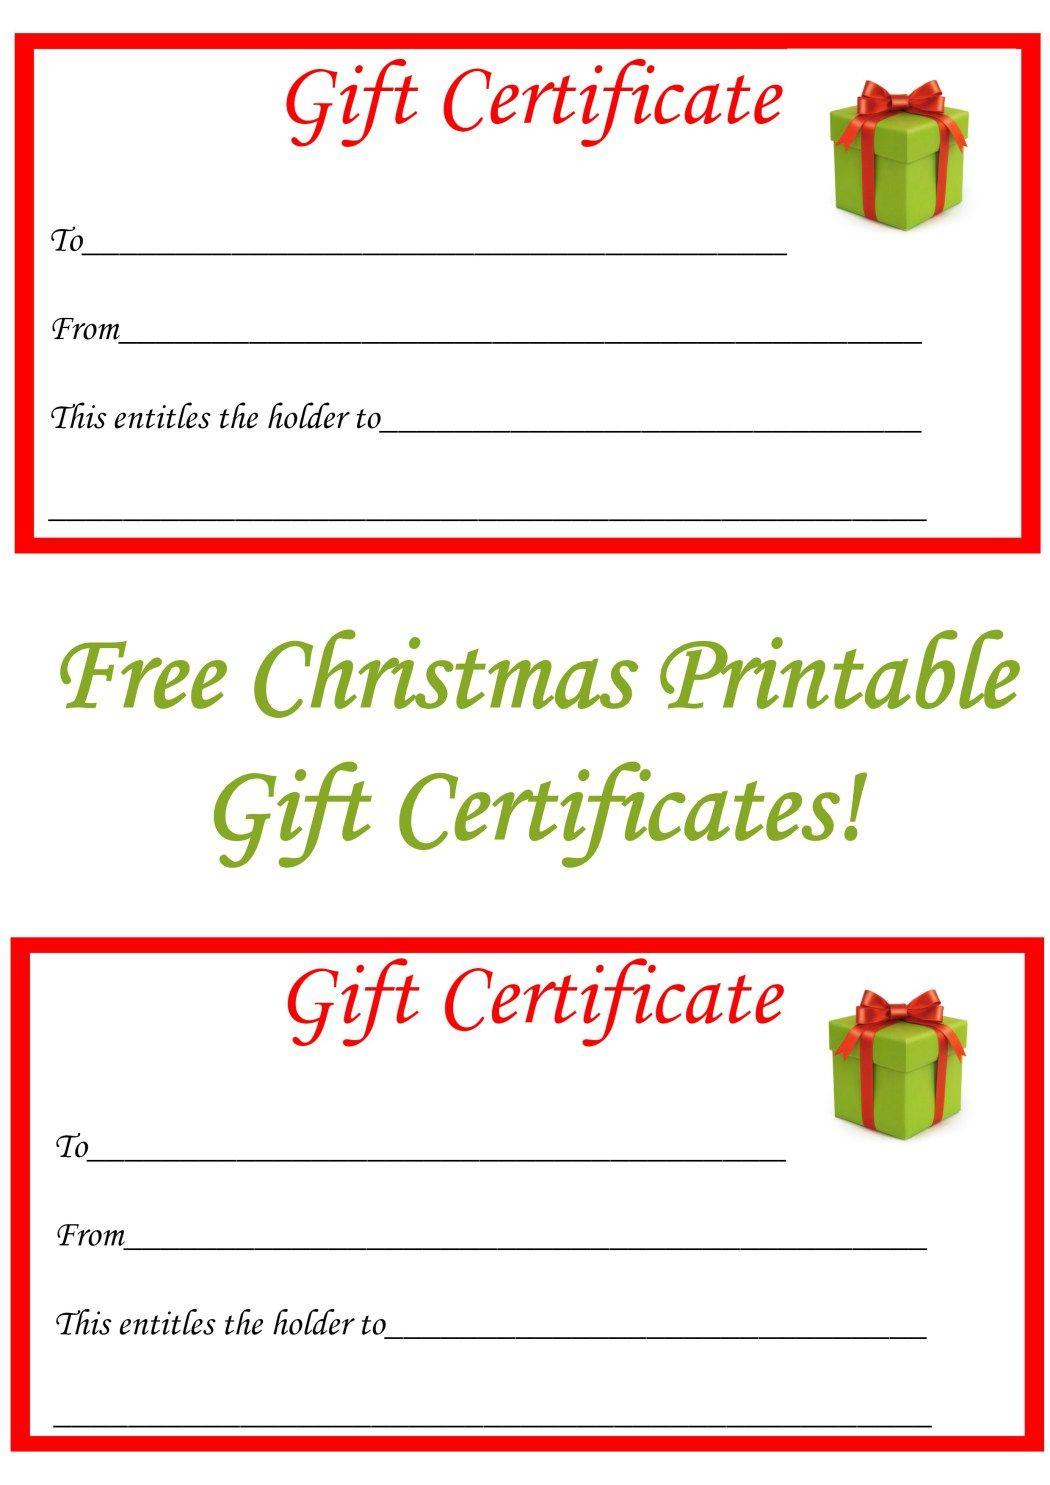 Free Christmas Printable Gift Certificates | Gift Ideas | Christmas - Free Printable Christmas Gift Cards